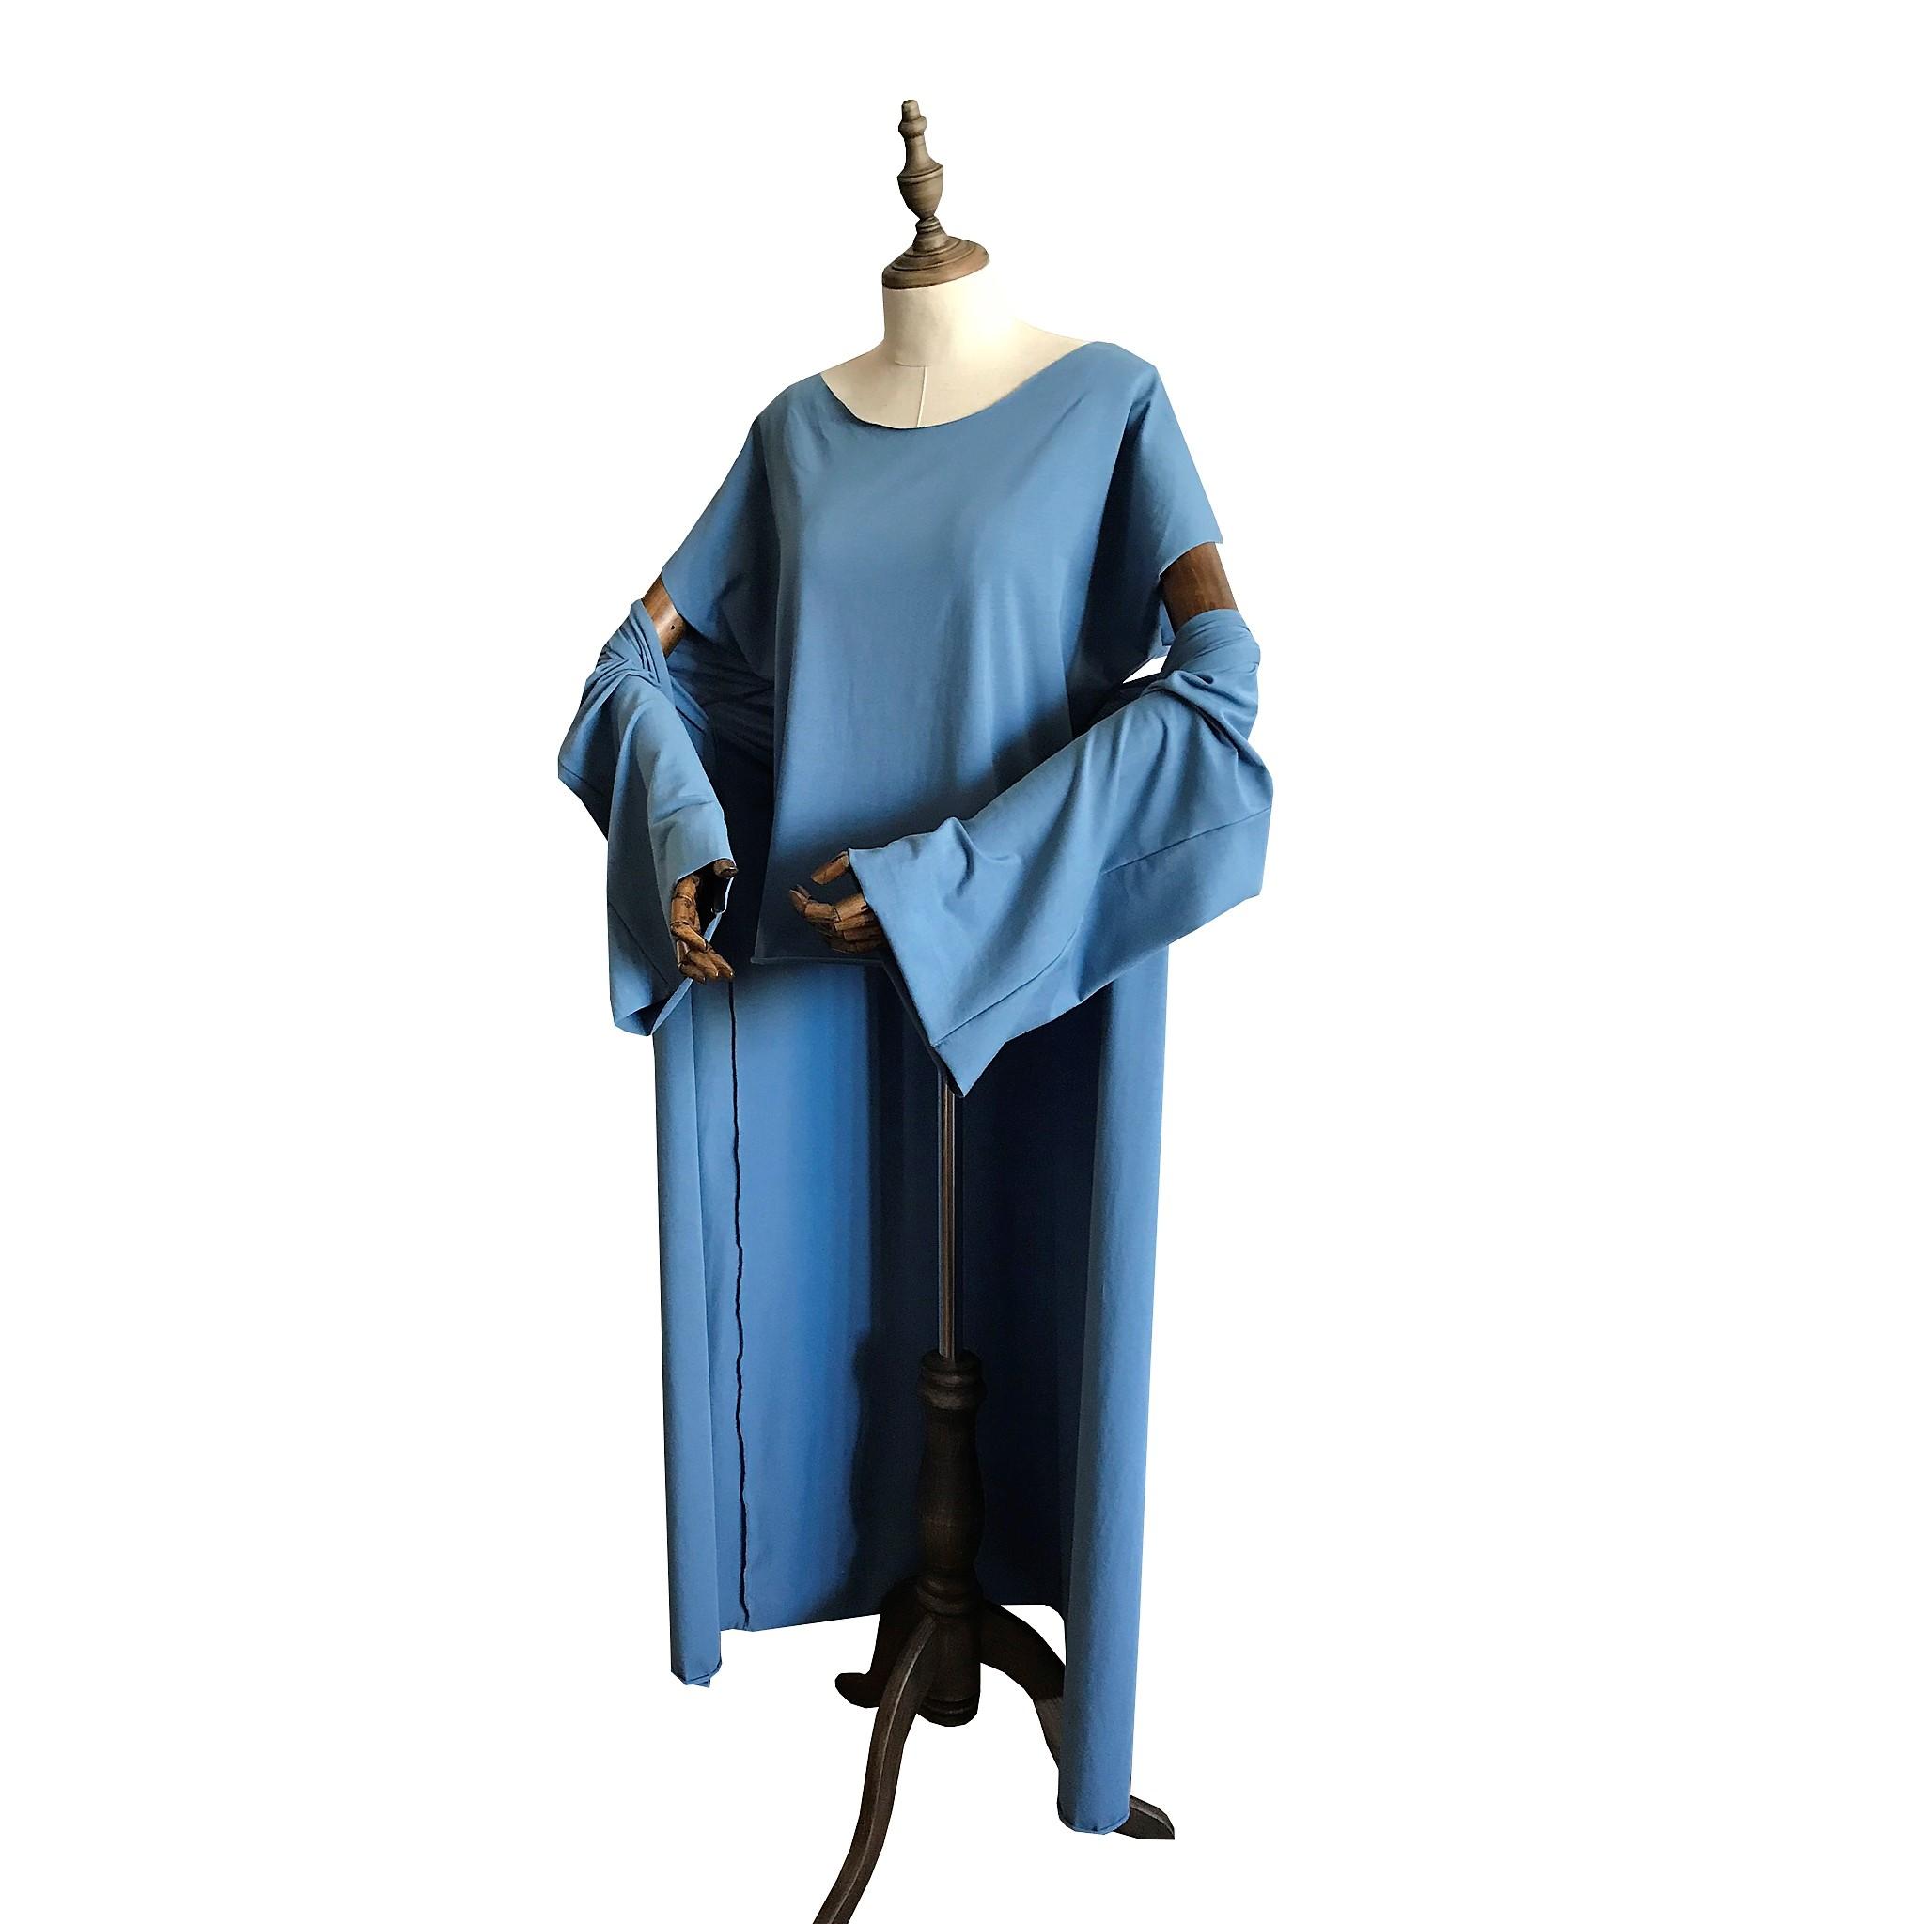 Накидка кимоно Рамайога (0,3 кг, OS (42-46), голубой)